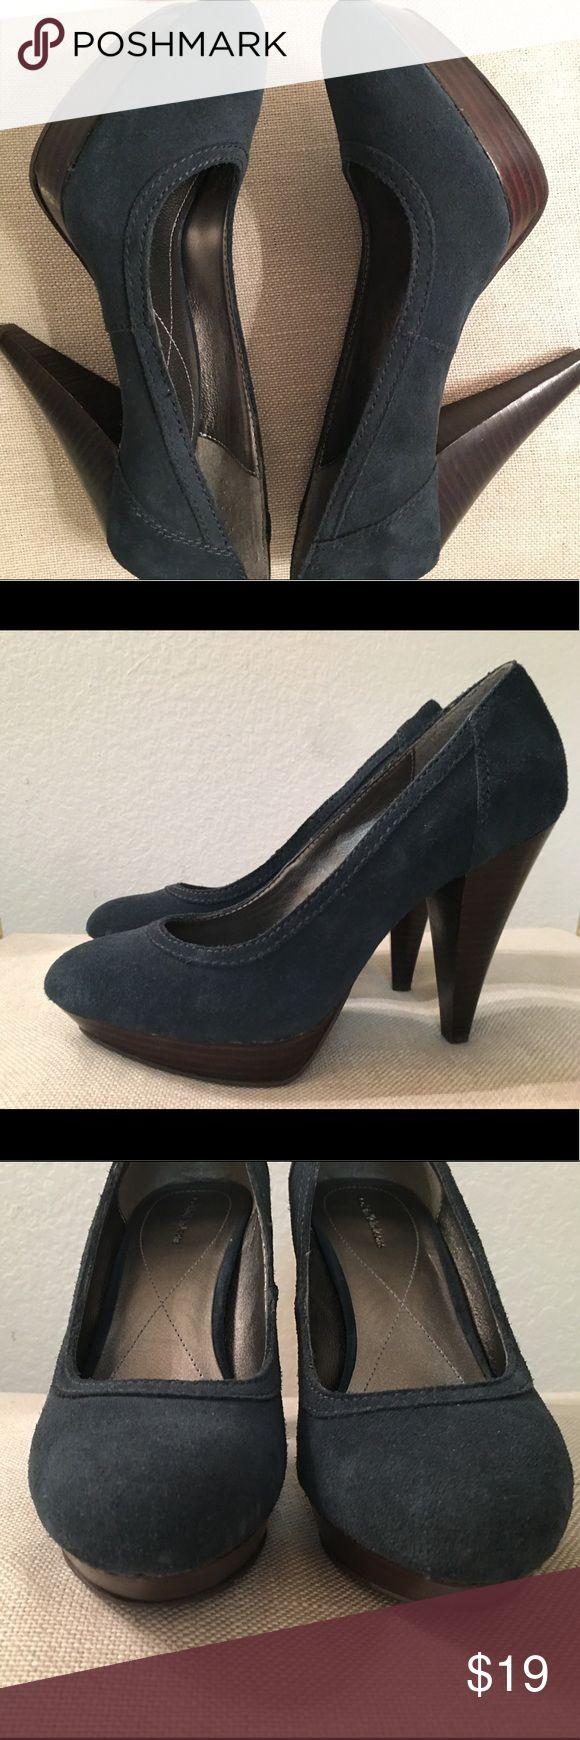 Calvin Klein blue suede platform pumps Calvin Klein blue suede platform pumps with chunky heel Calvin Klein Jeans Shoes Heels